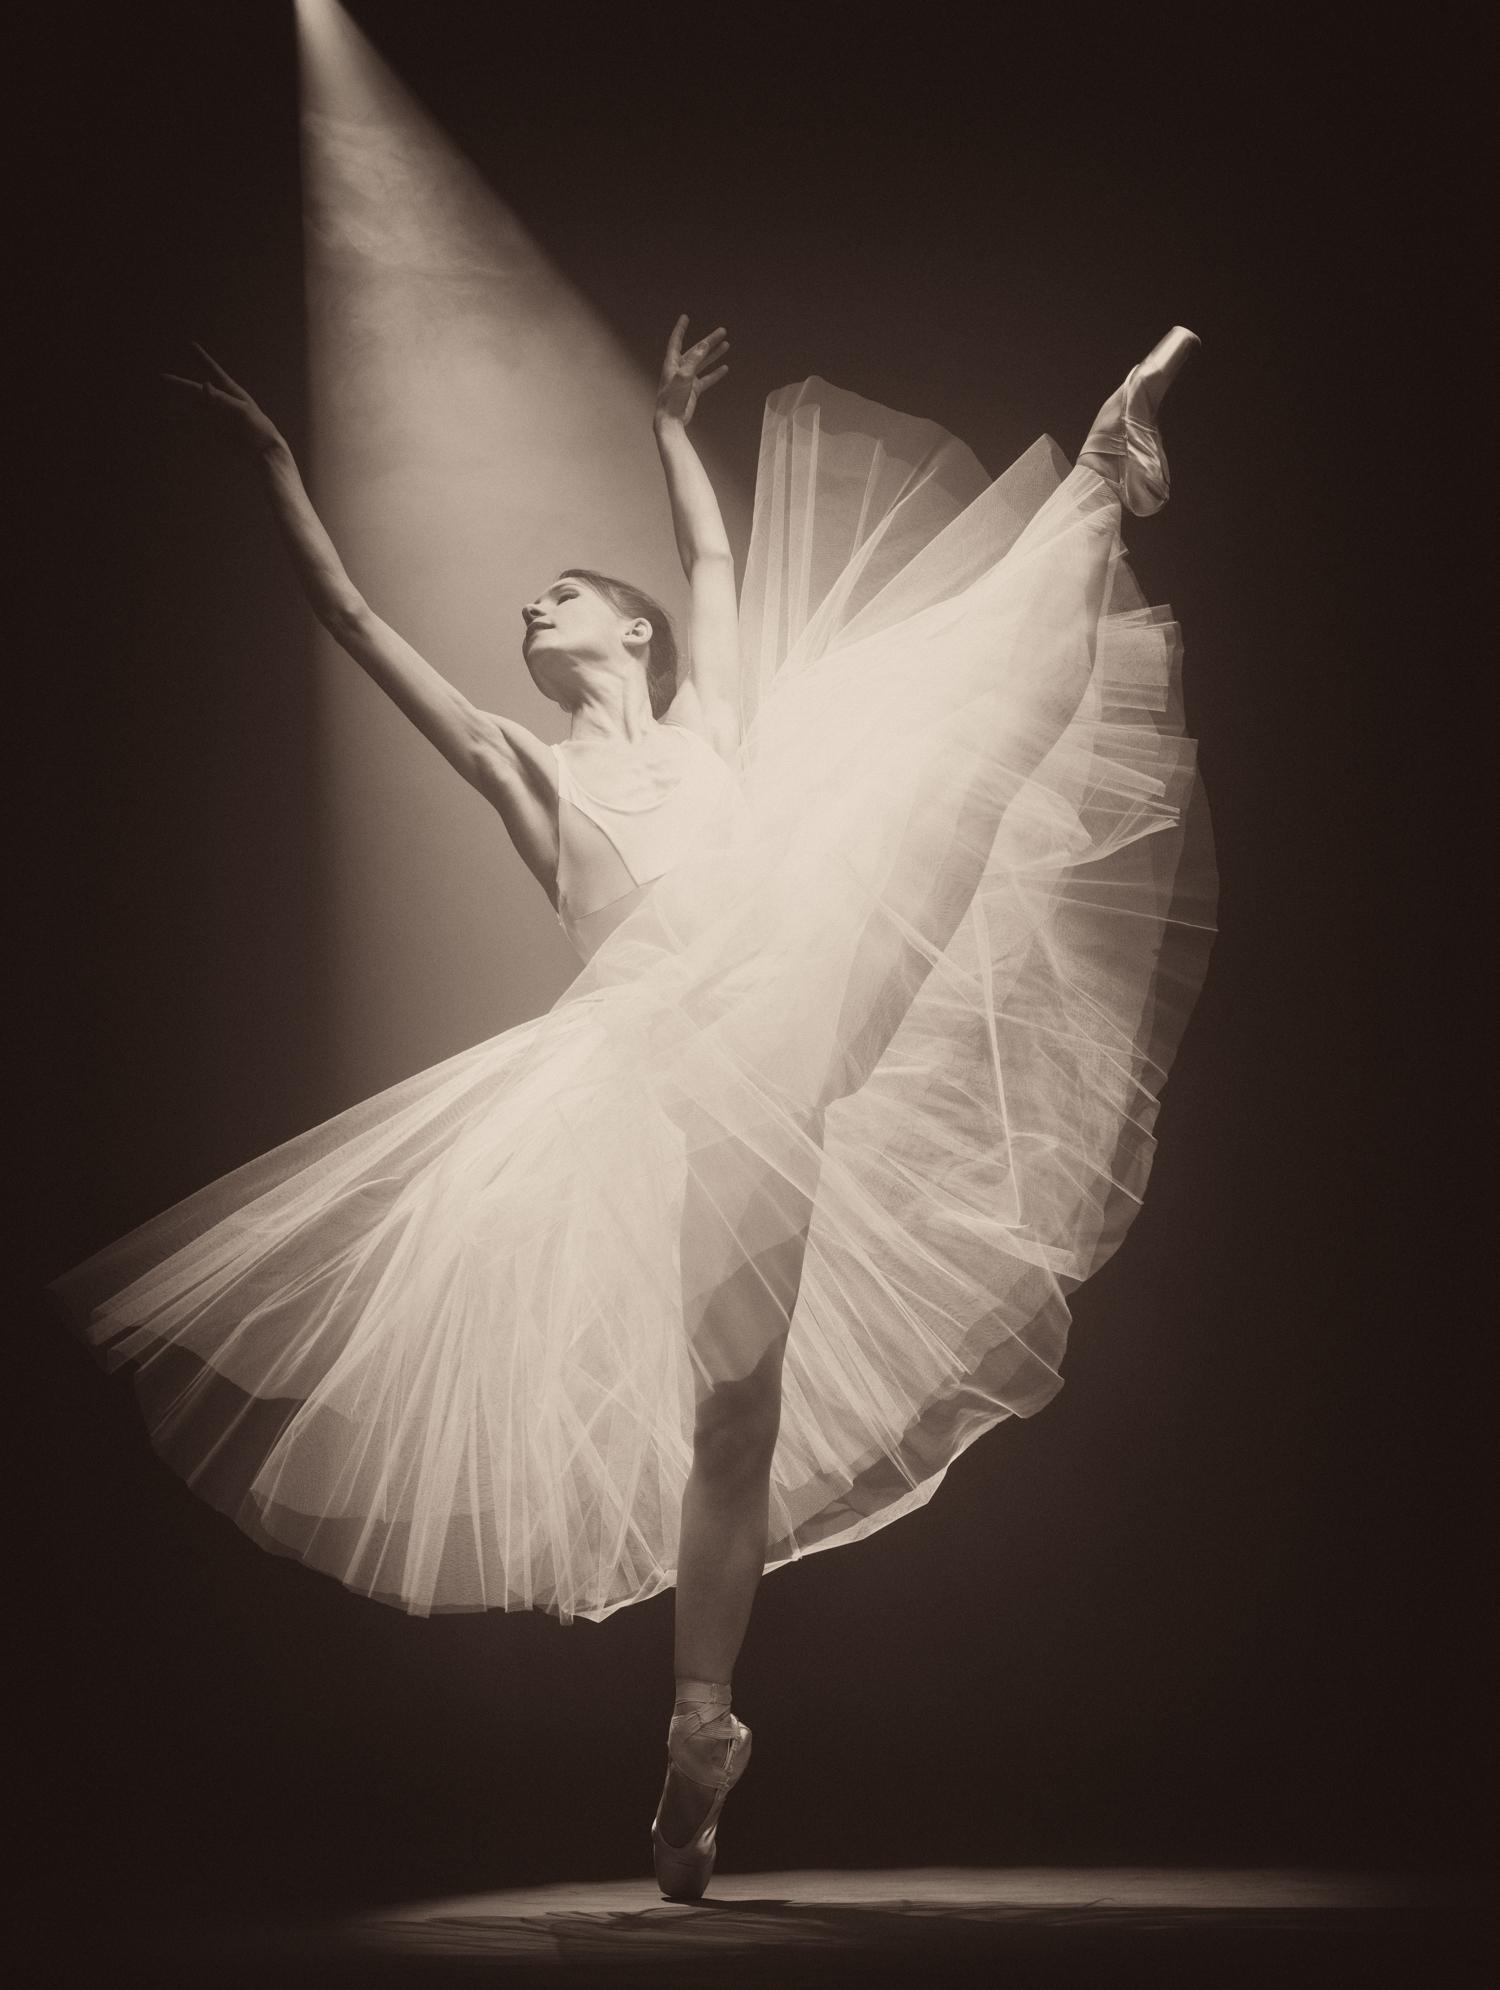 birnbach-dance_photo-20130202-9360.jpg